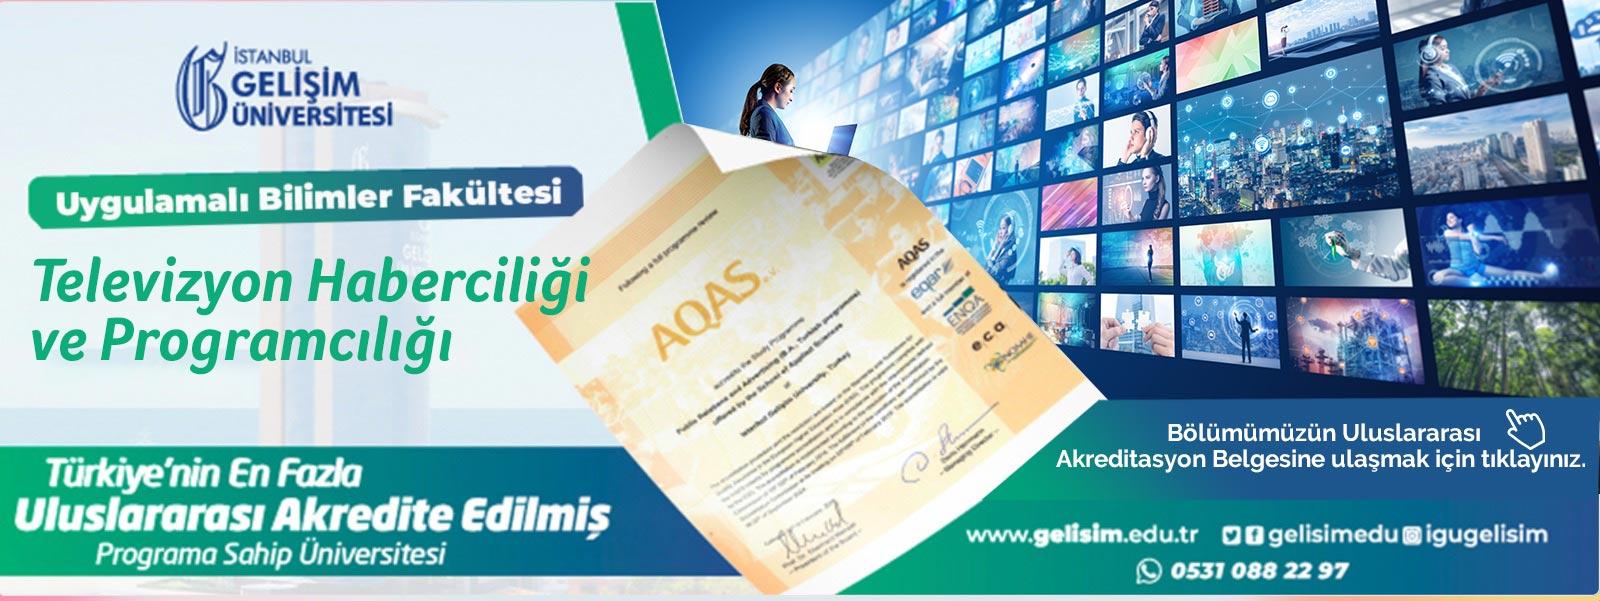 TELEVİZYON HABERCİLİĞİ VE PROGRAMCILIĞI  - Accreditation